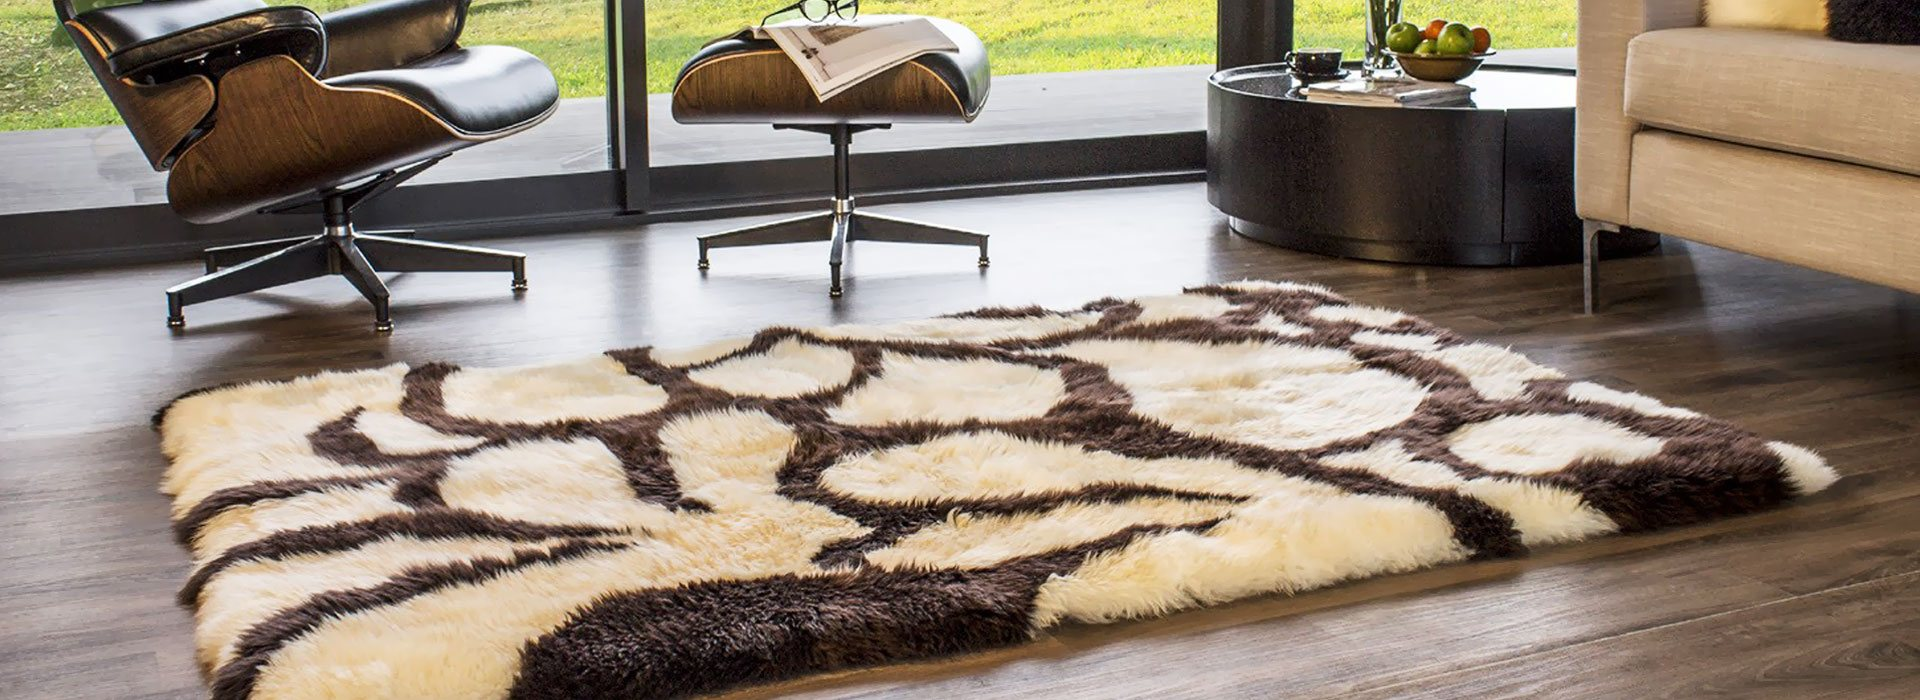 sheepskin-rugs